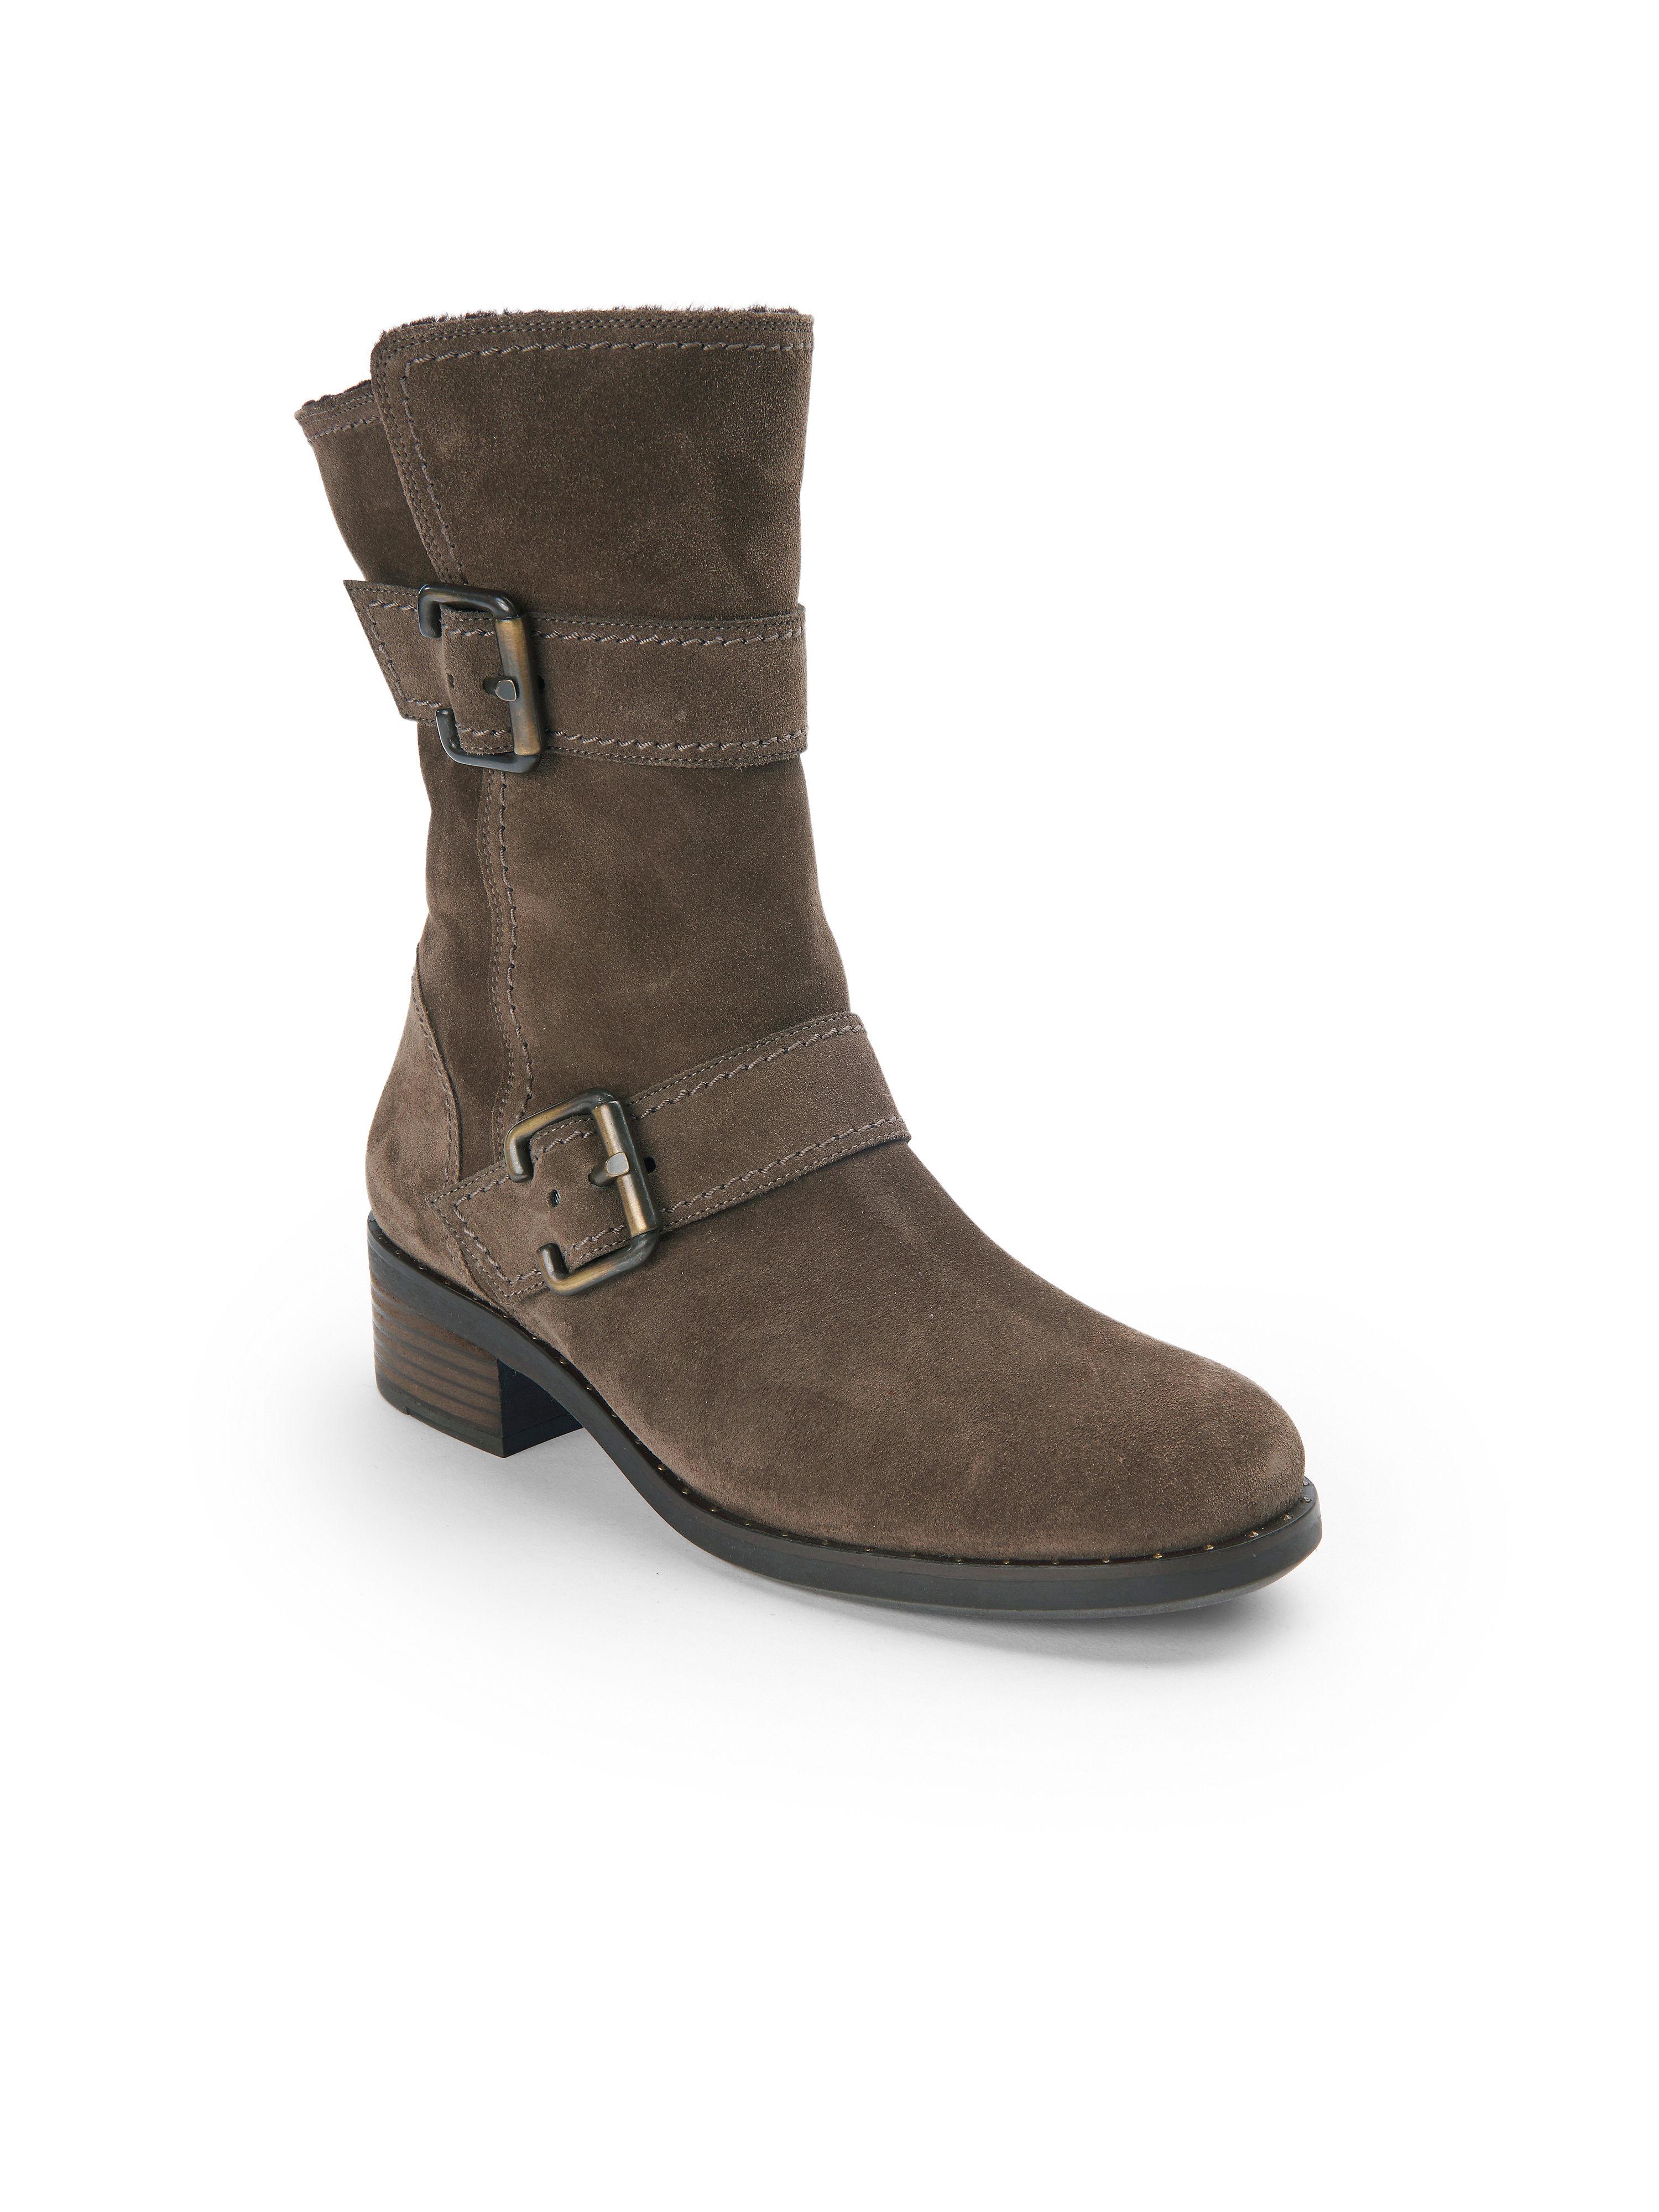 Paul Green - Stiefelette - Schuhe Nussbraun Gute Qualität beliebte Schuhe - fbe128